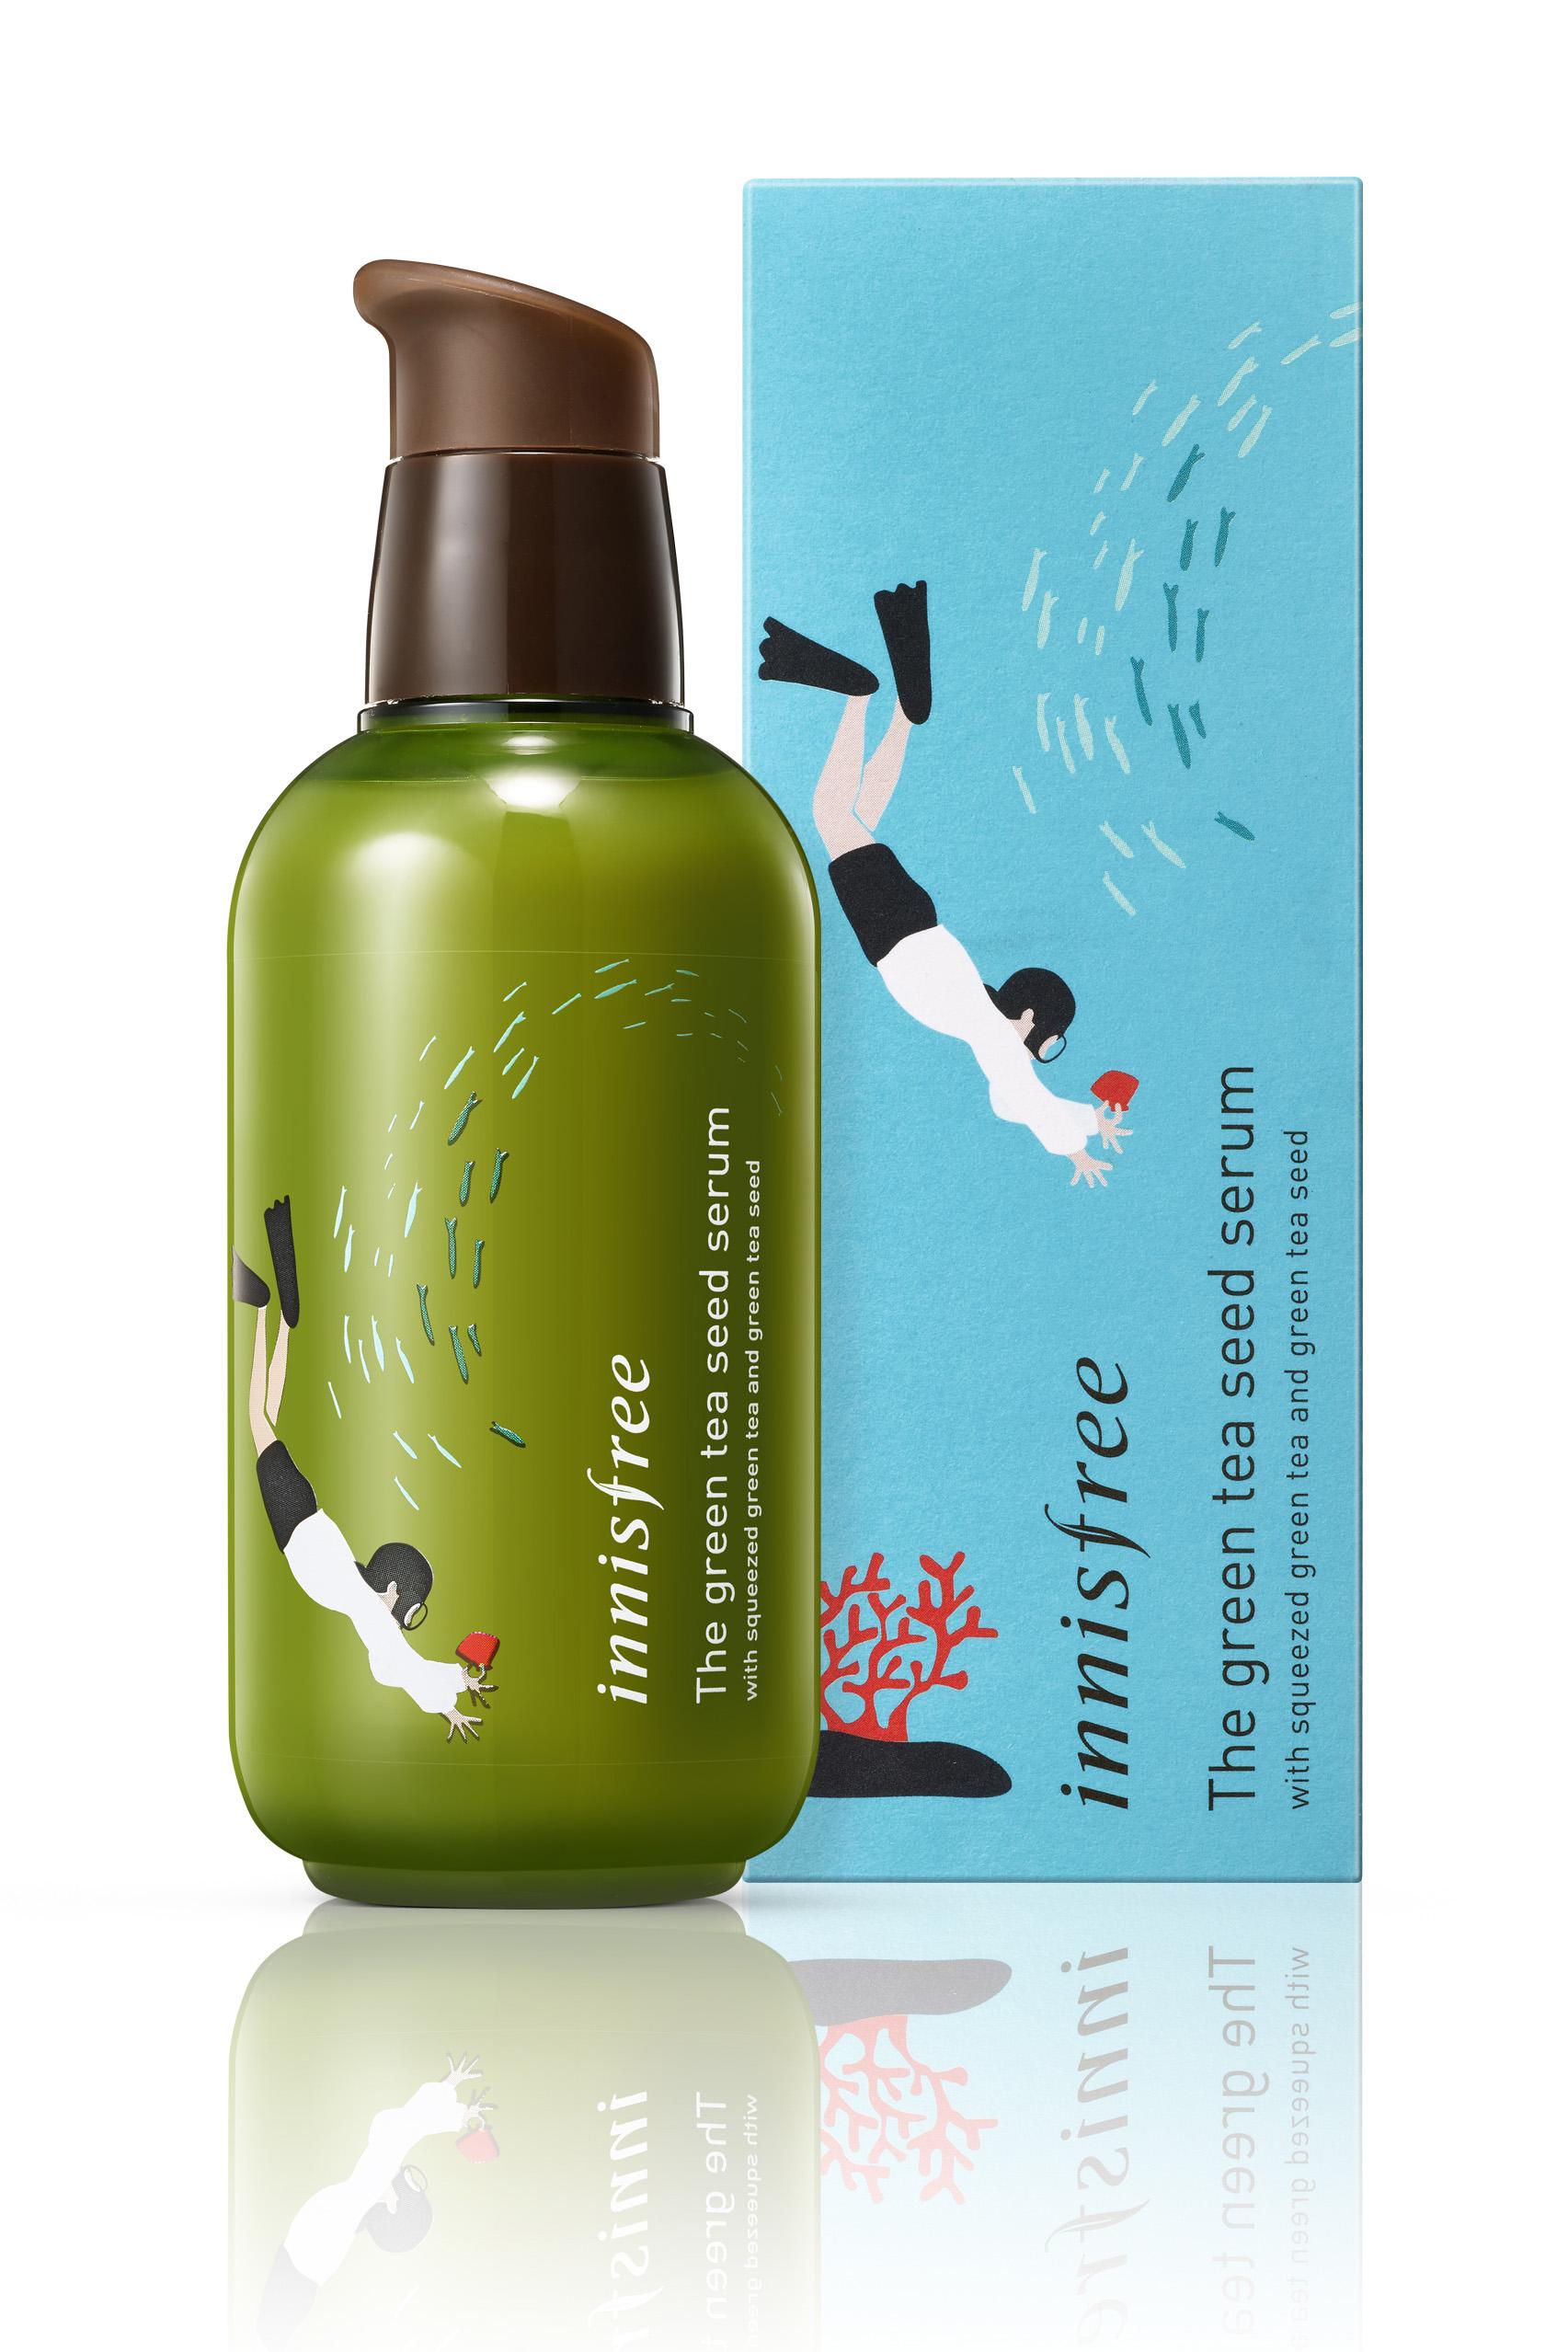 The green tea seed serum (Limited edition Eca-Hankie campaign)